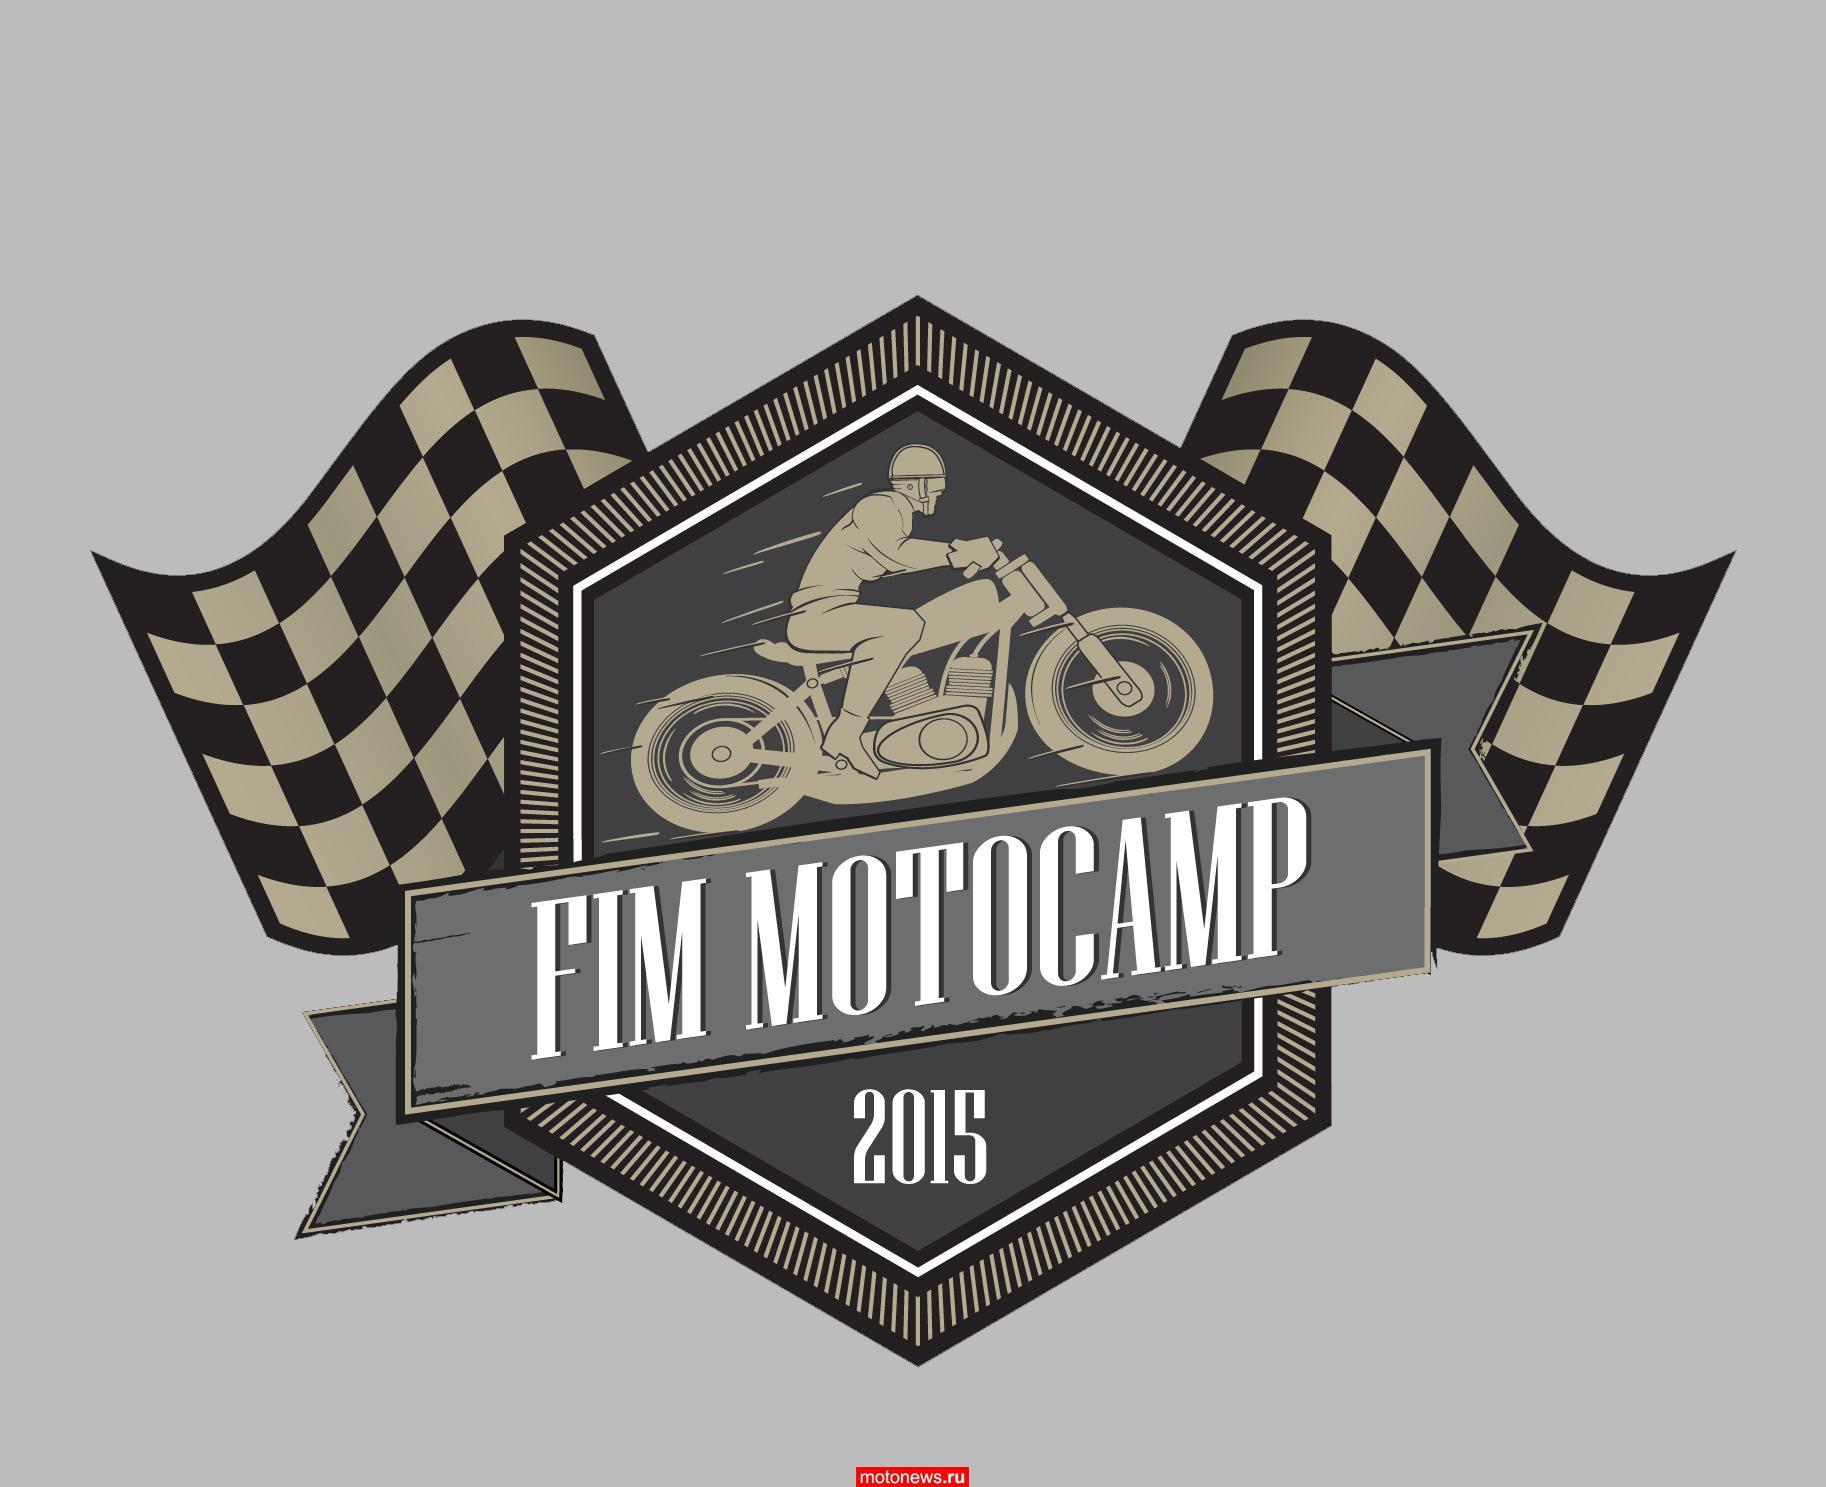 Motocamp-2015 в Петербурге отменен